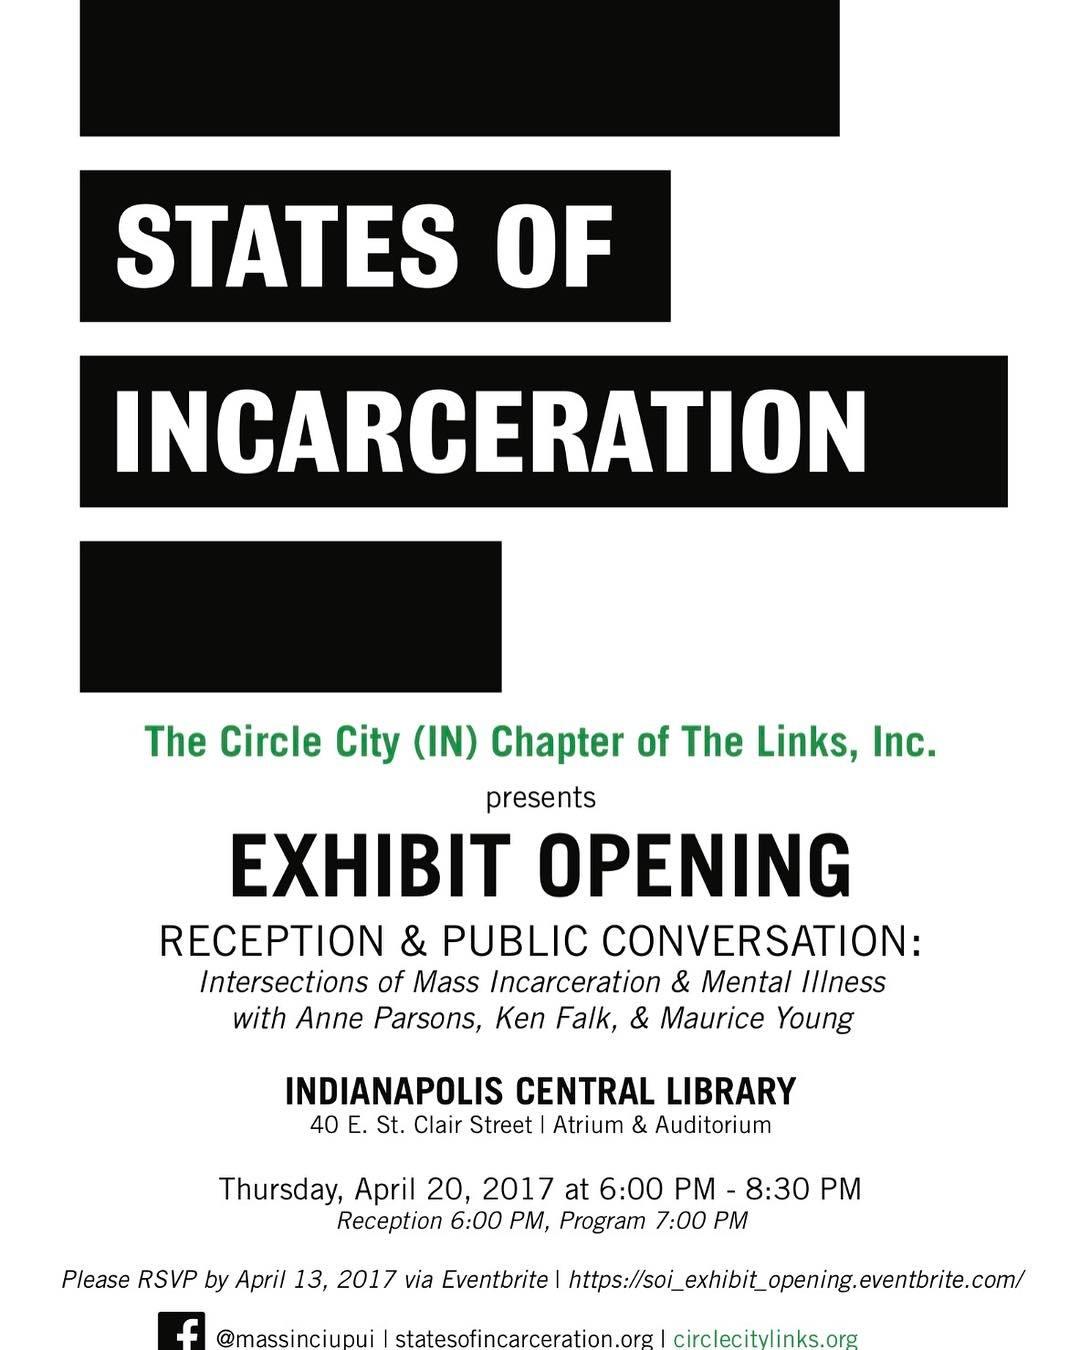 States of Incarceration